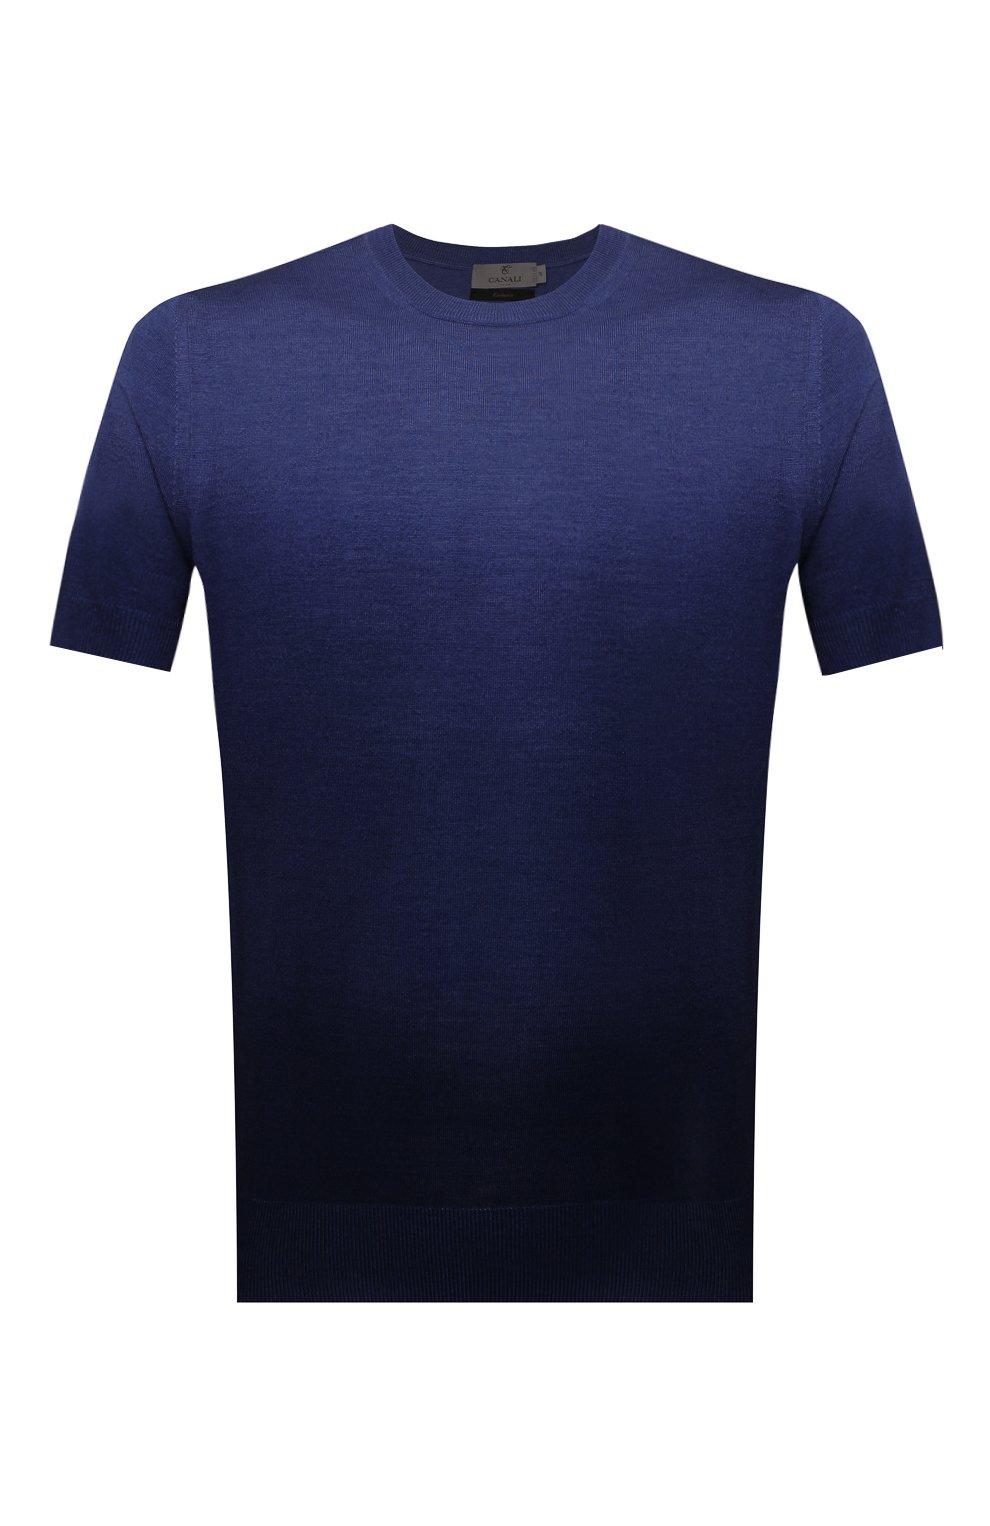 Мужской джемпер из шерсти и шелка CANALI темно-синего цвета, арт. C0719/MX01166 | Фото 1